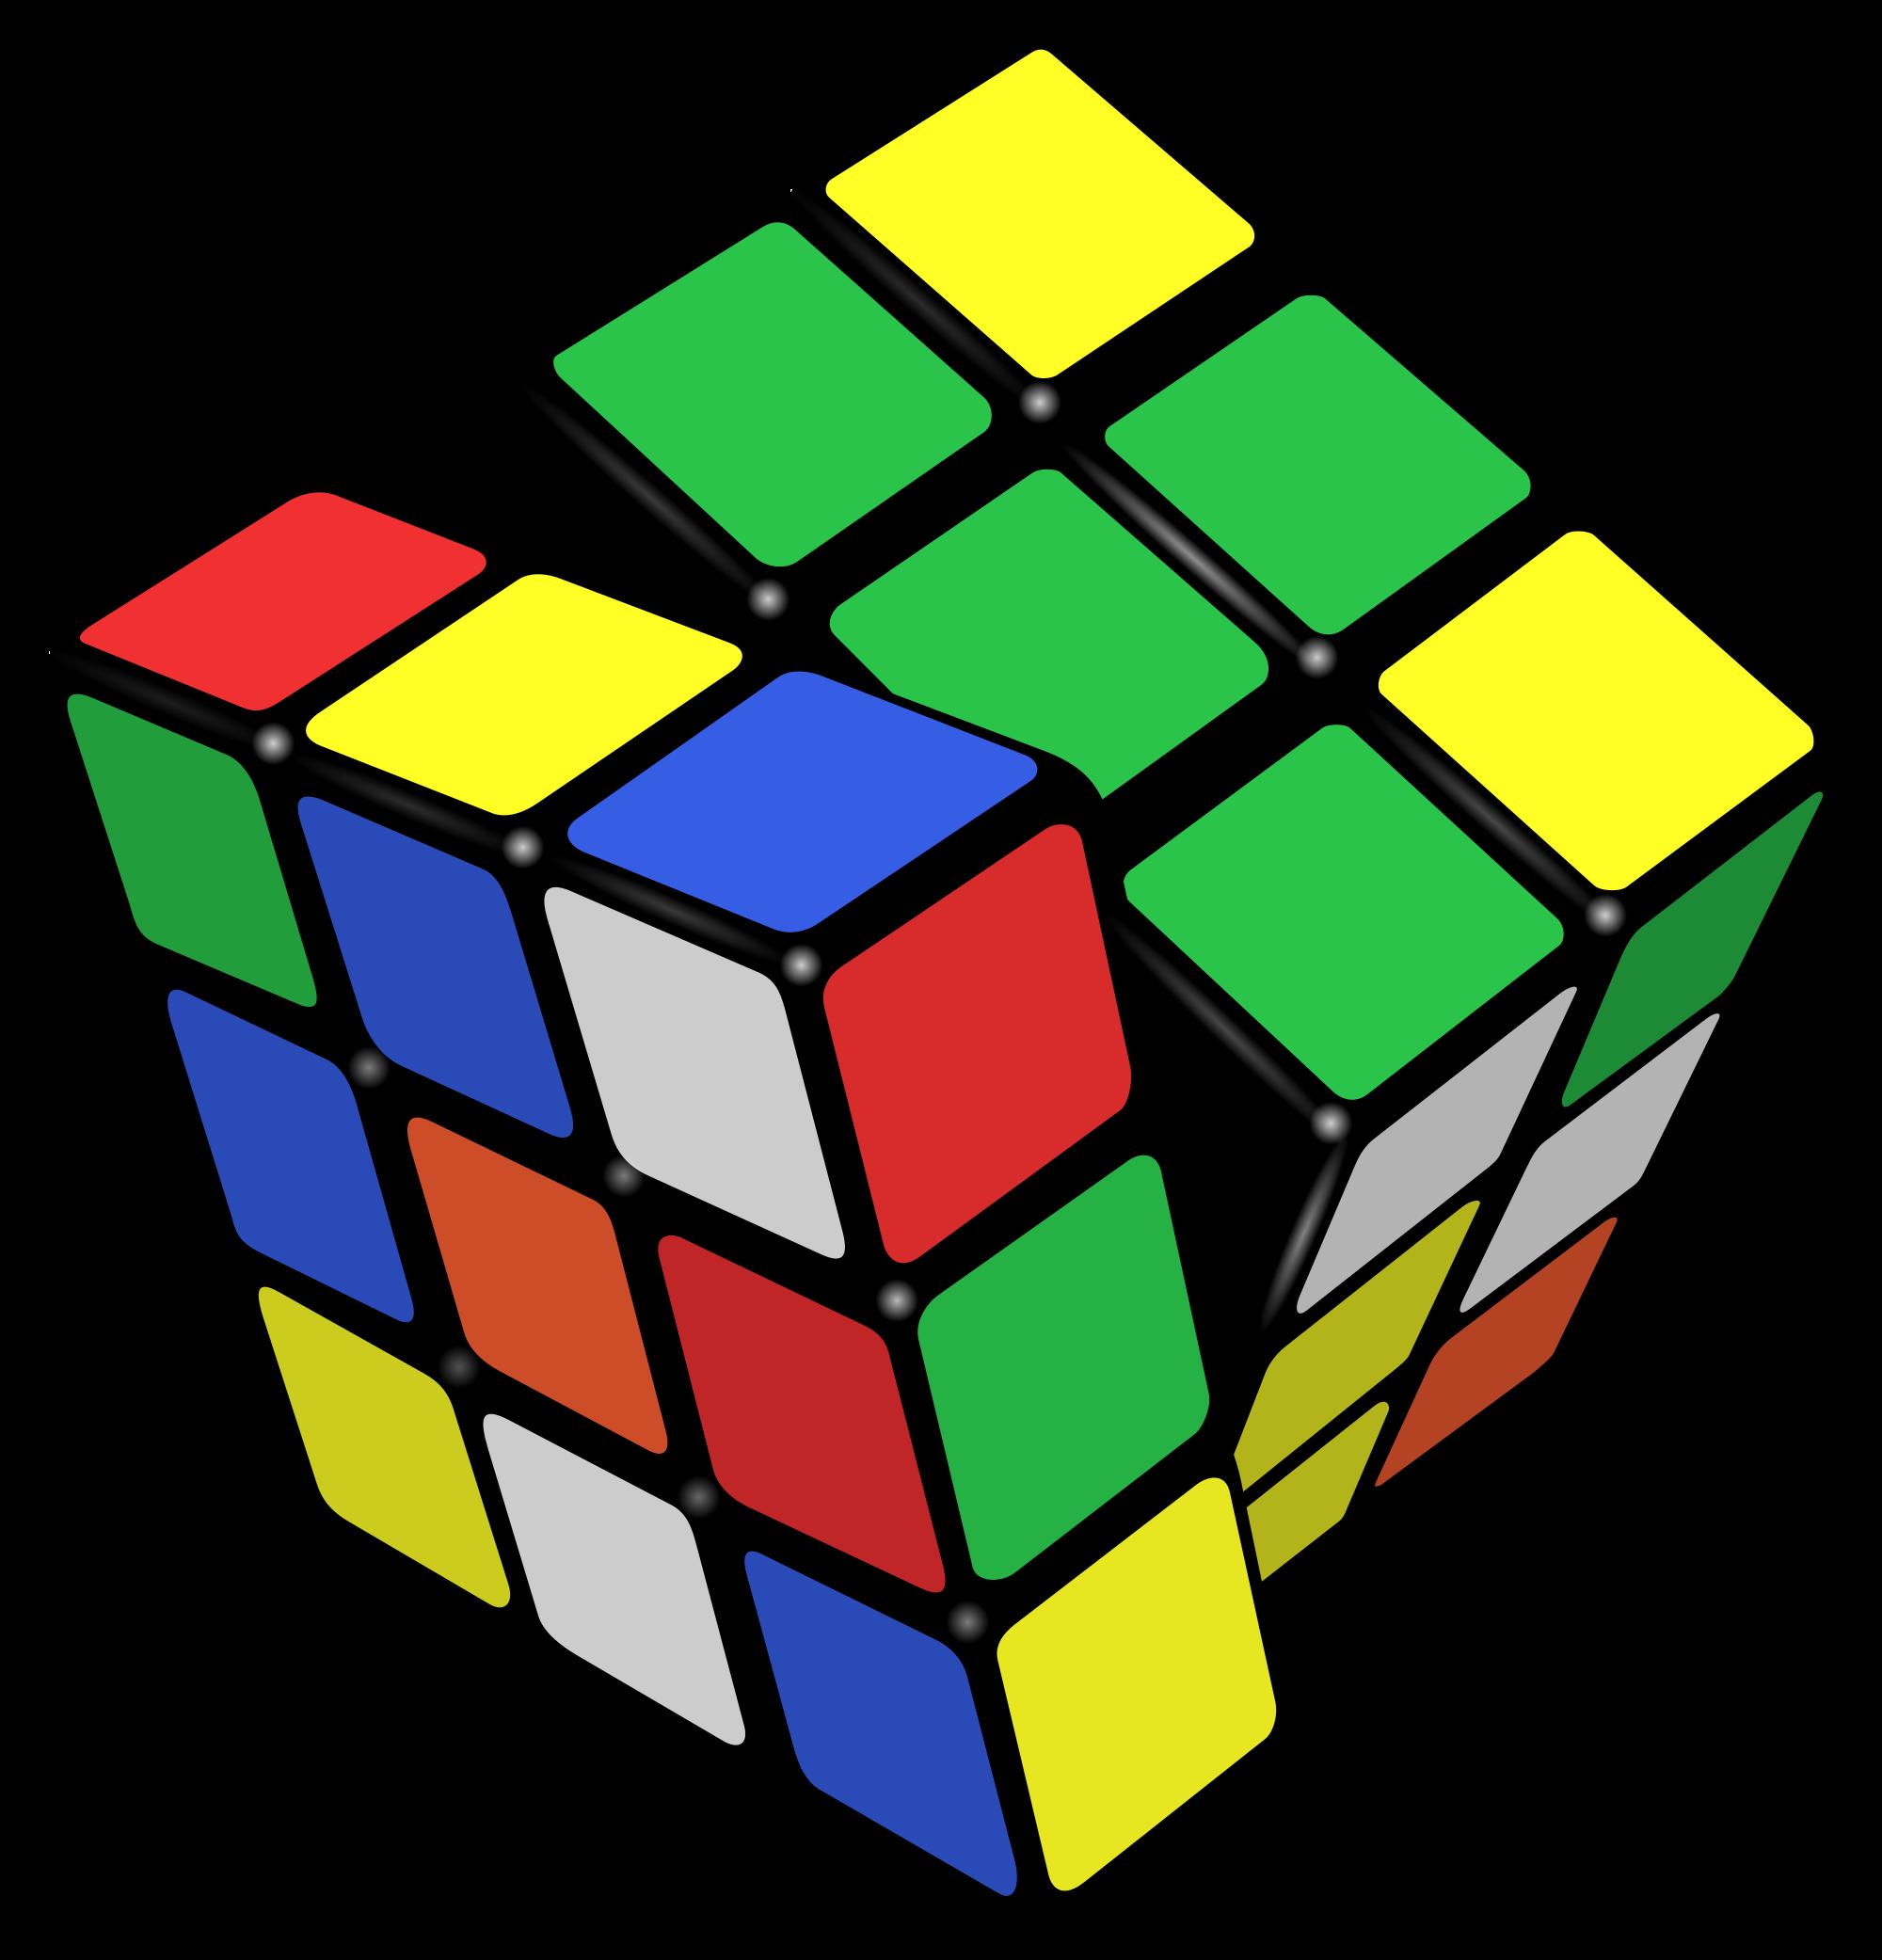 cube clipart non living